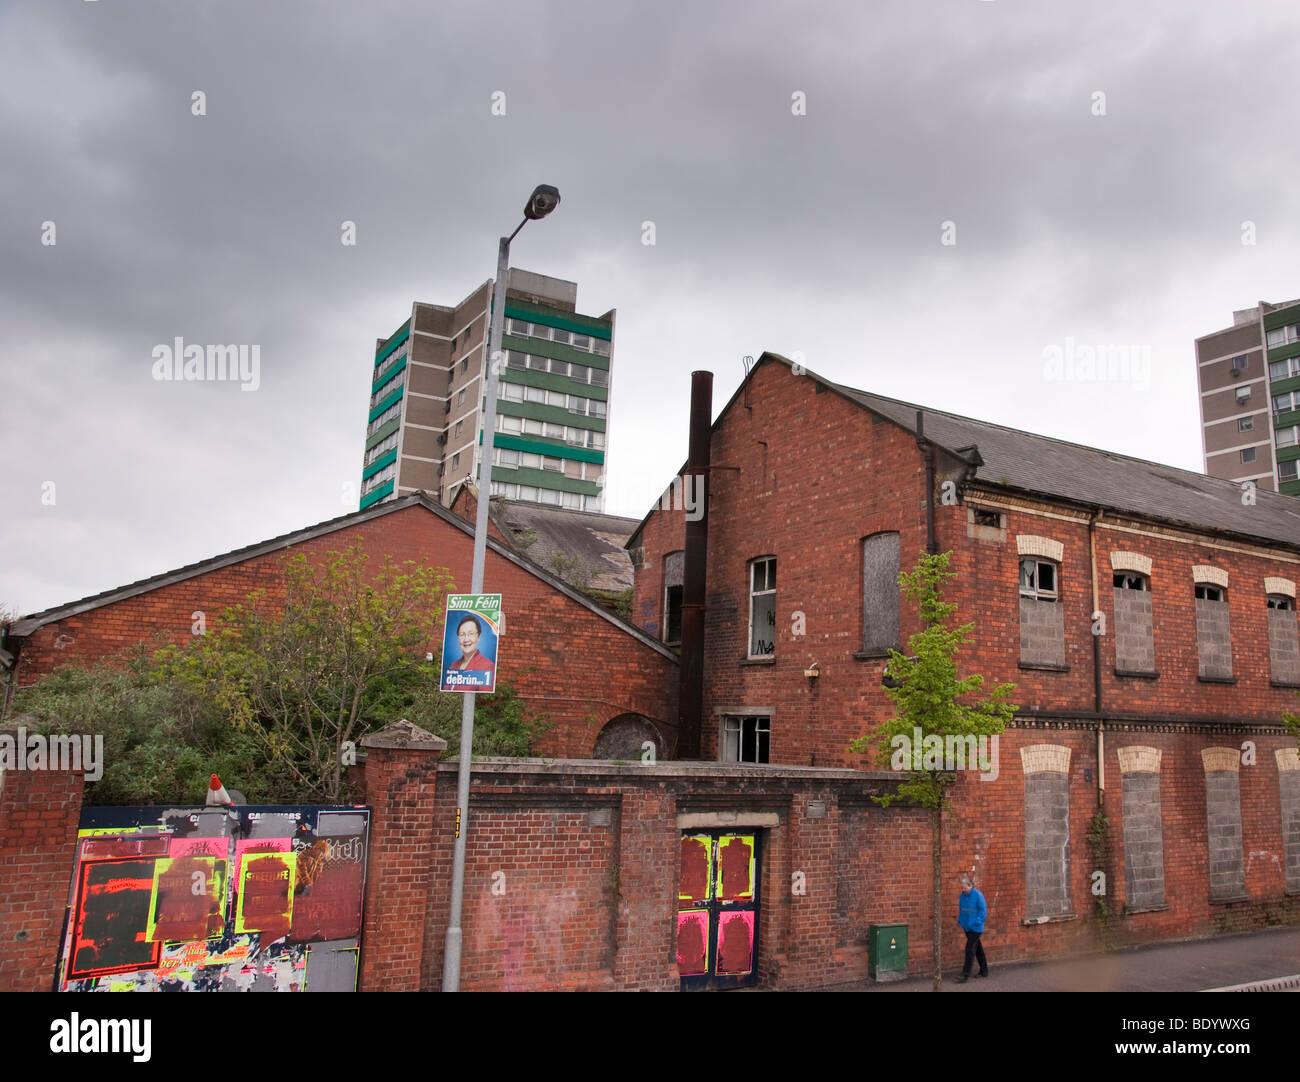 Belfast Ireland 2009 Sinn Fein poster and district - Stock Image